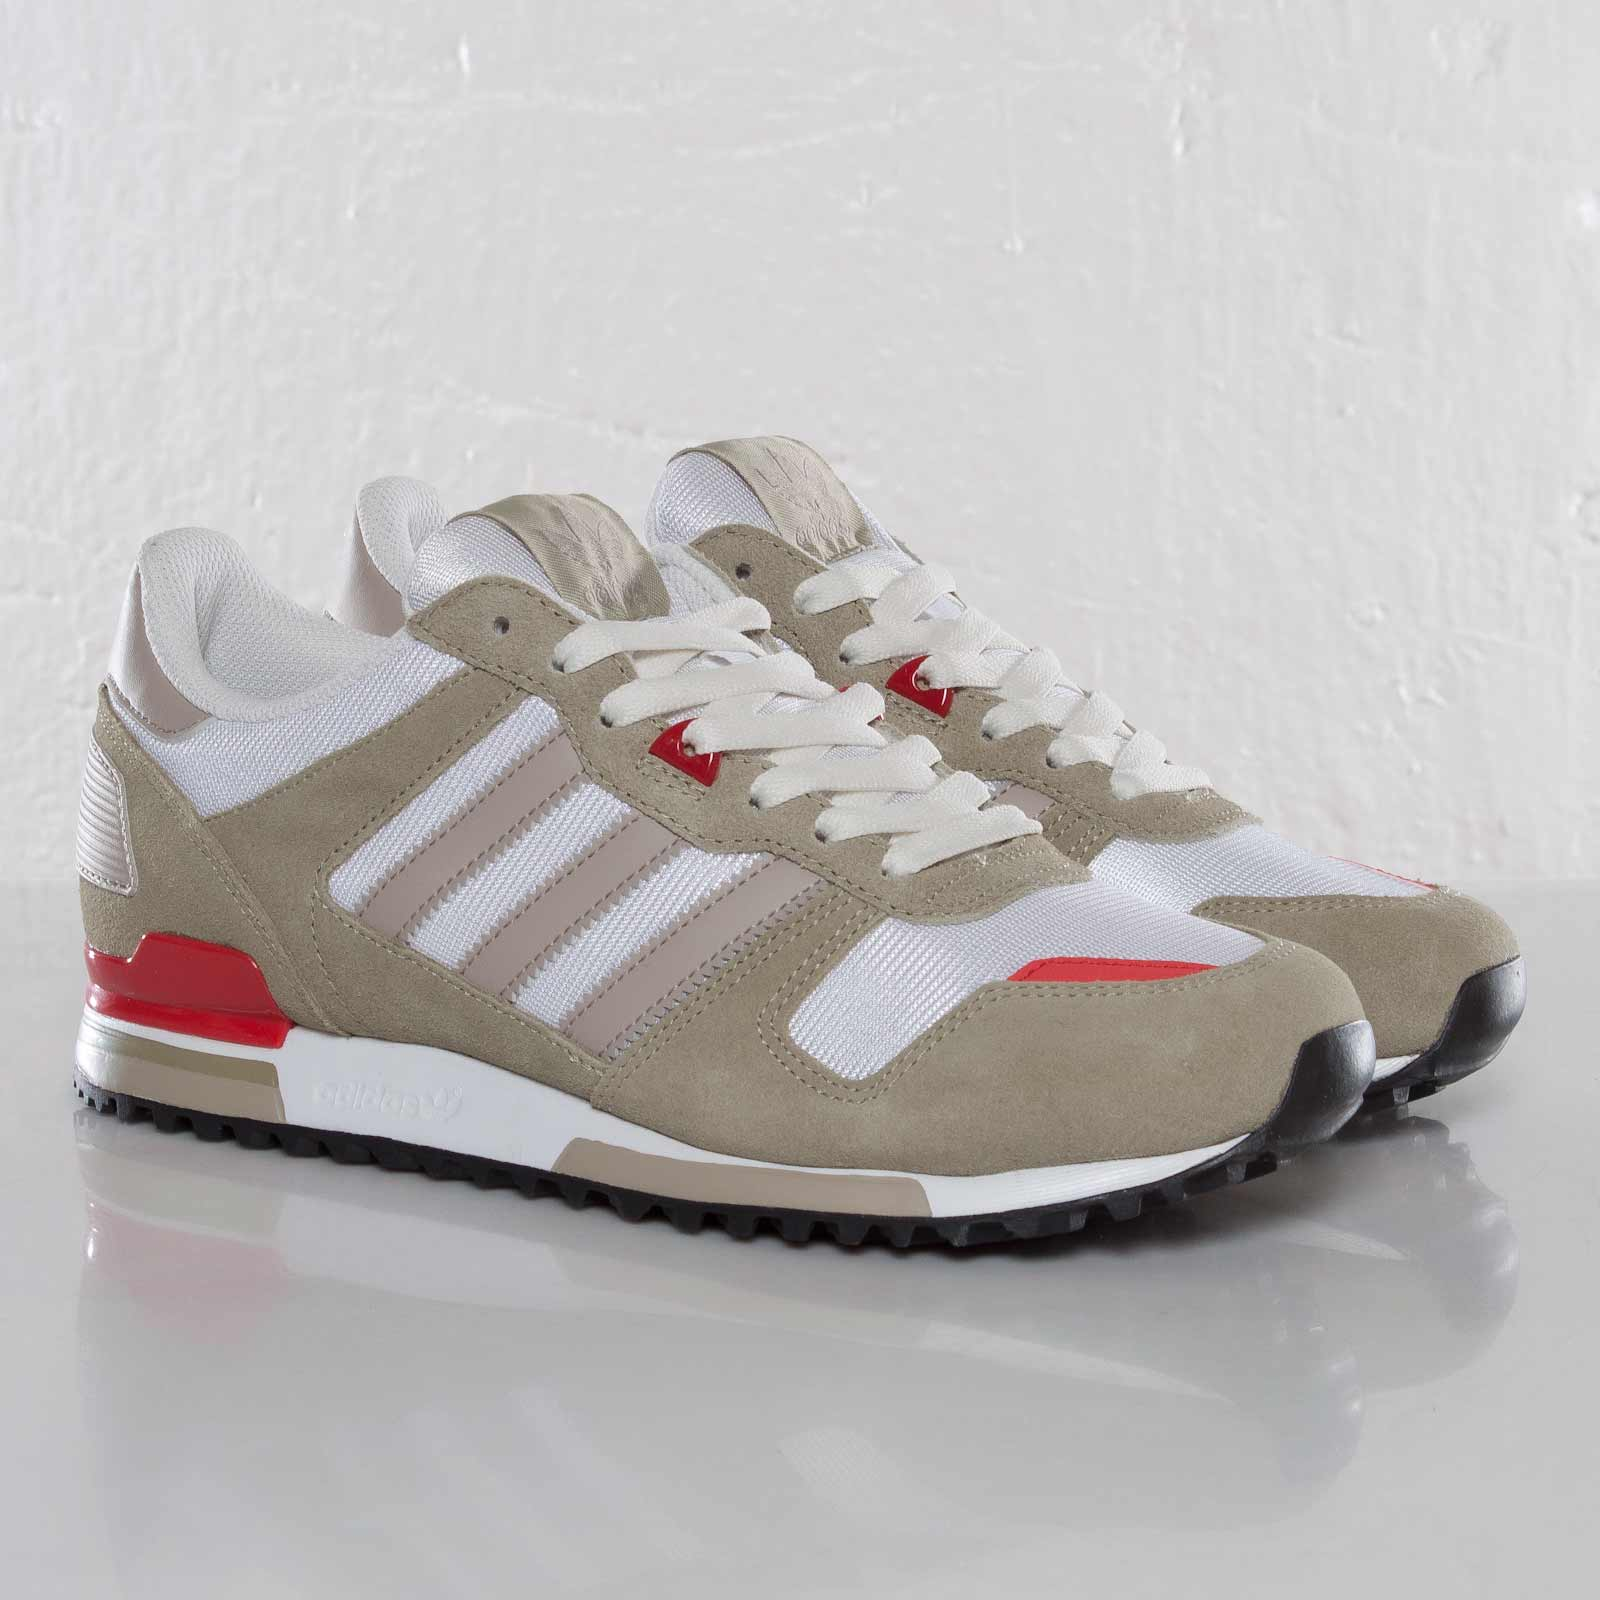 7045c8e29 adidas ZX 700 M - Q23445 - Sneakersnstuff